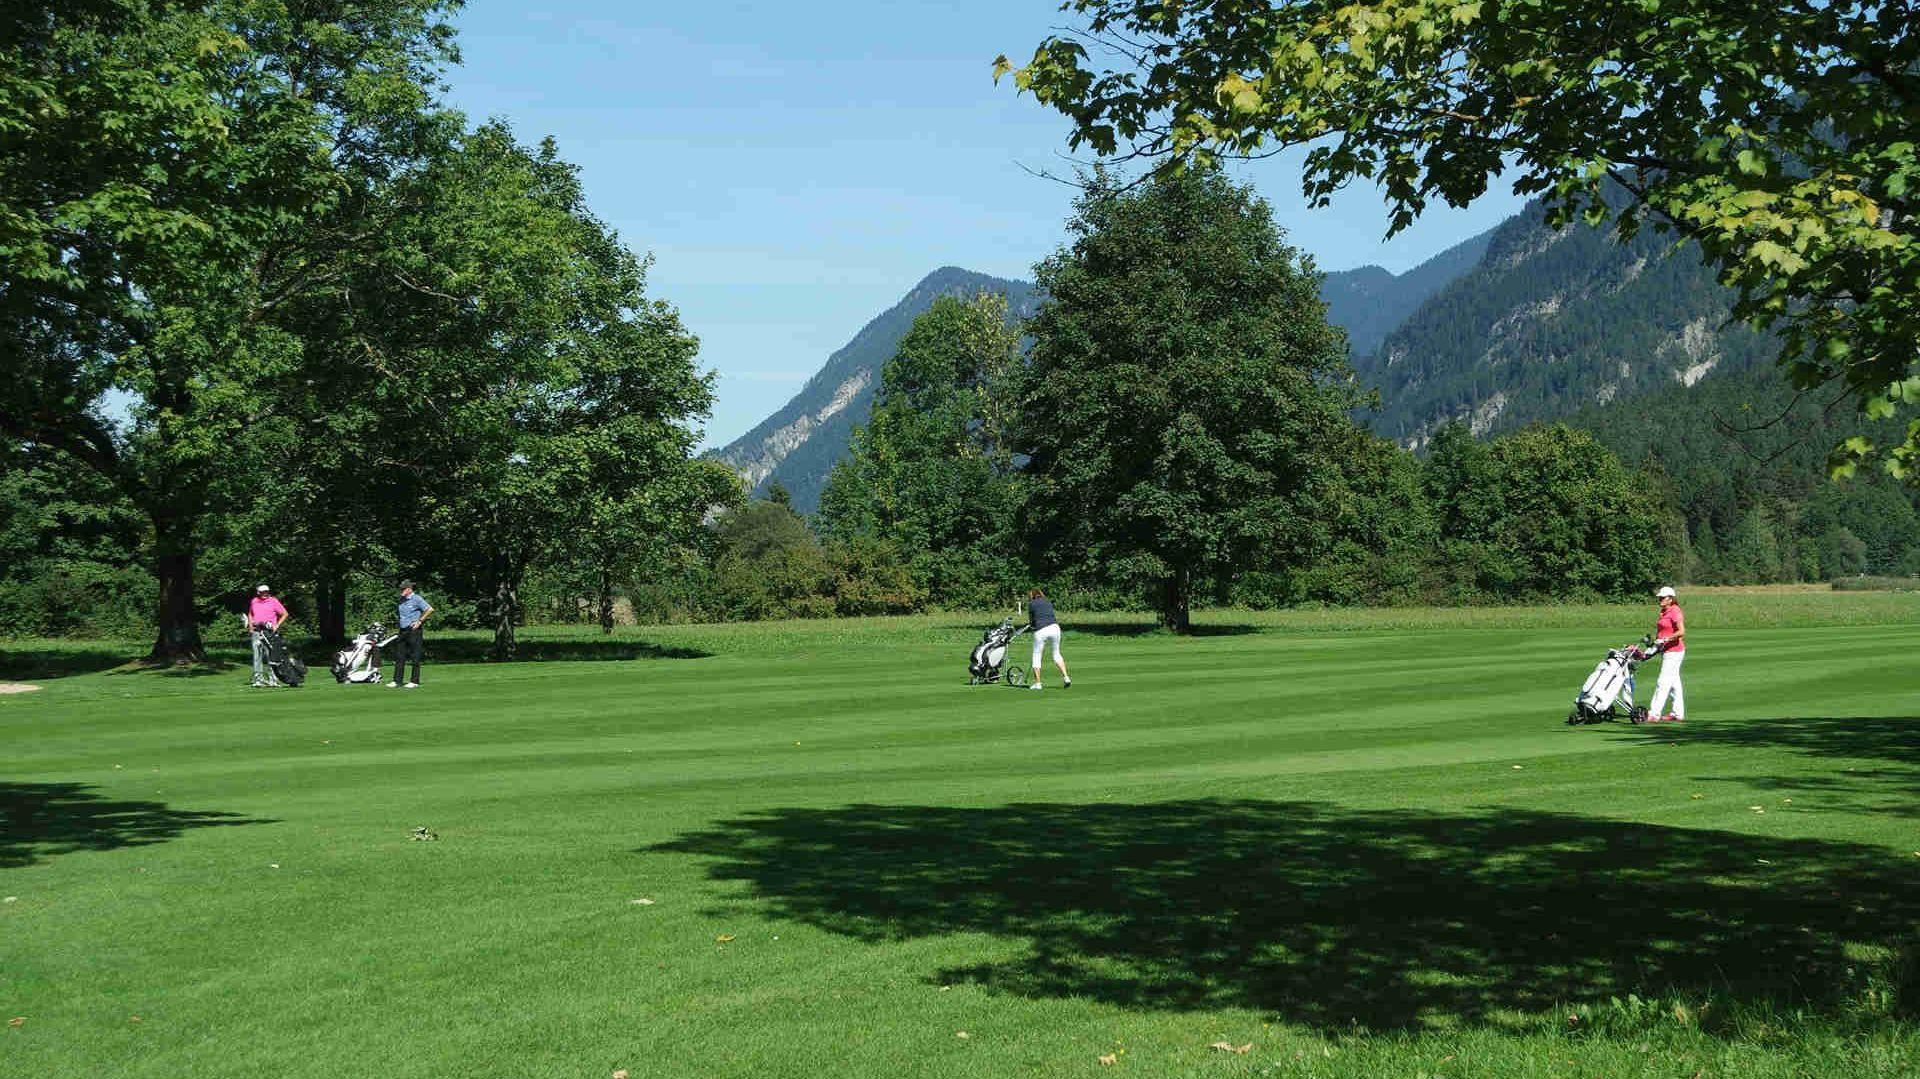 Golfplatz in Waakirchen am Tegernsee